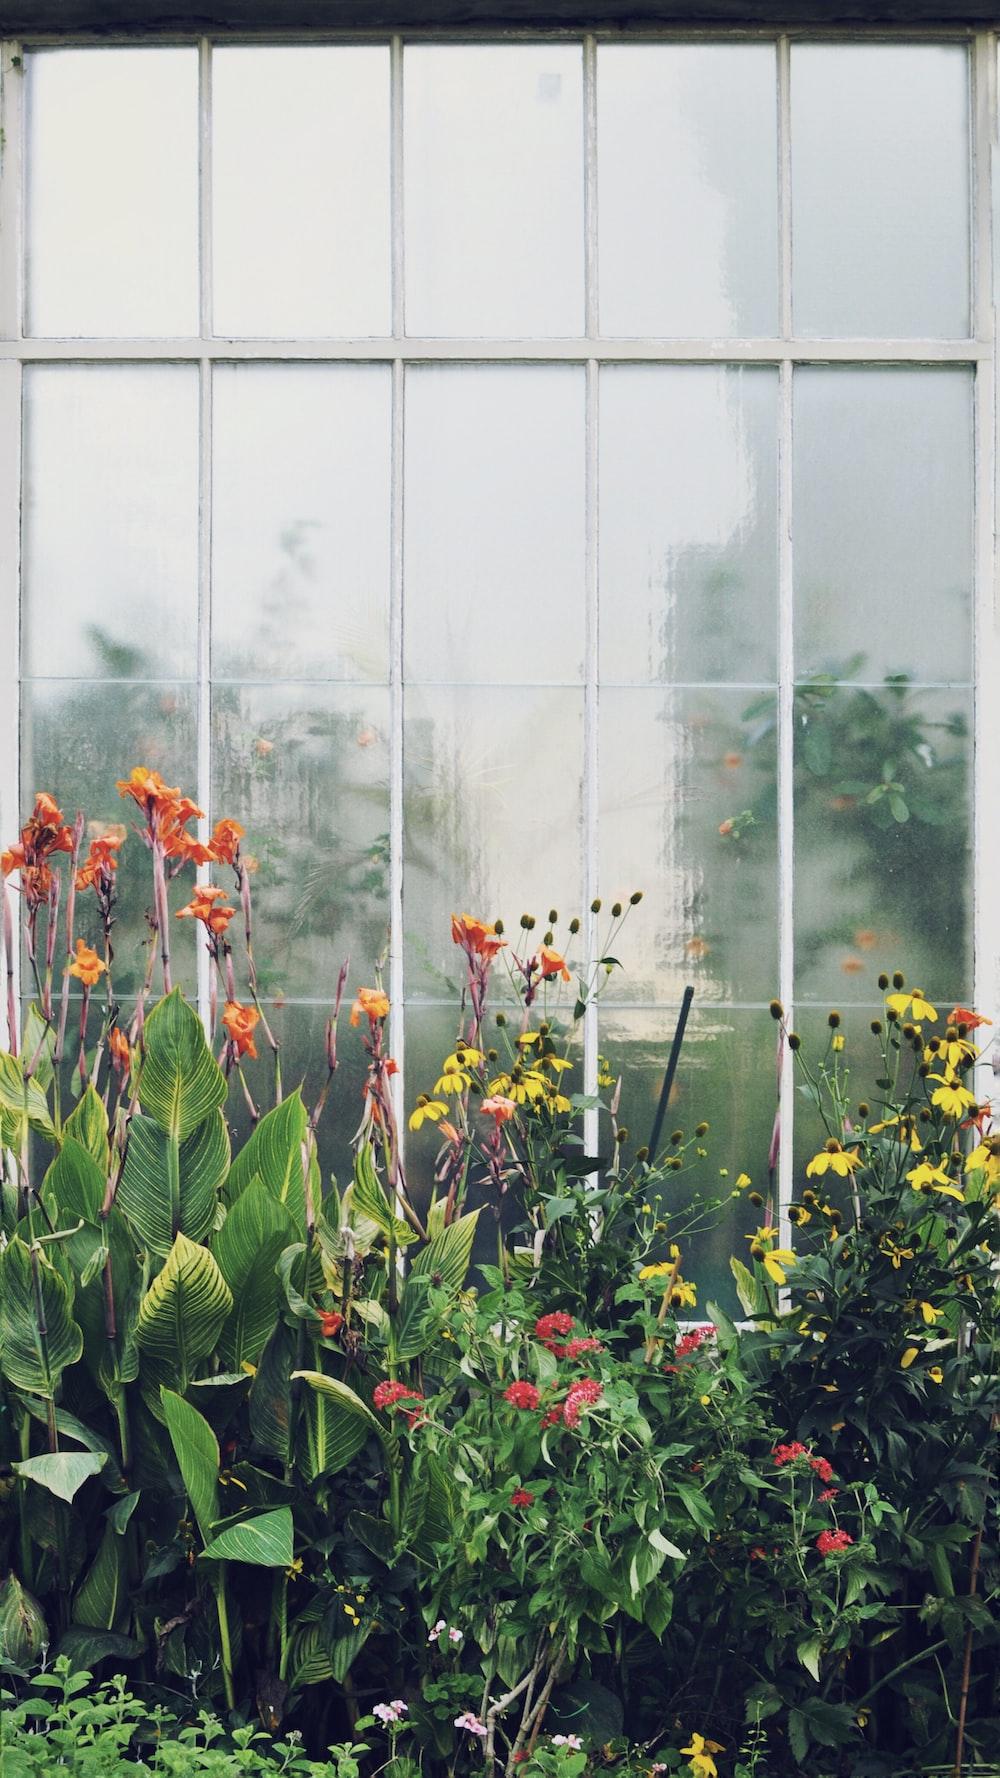 yellow and orange petaled flowers beside window - Columbus Botanical Garden